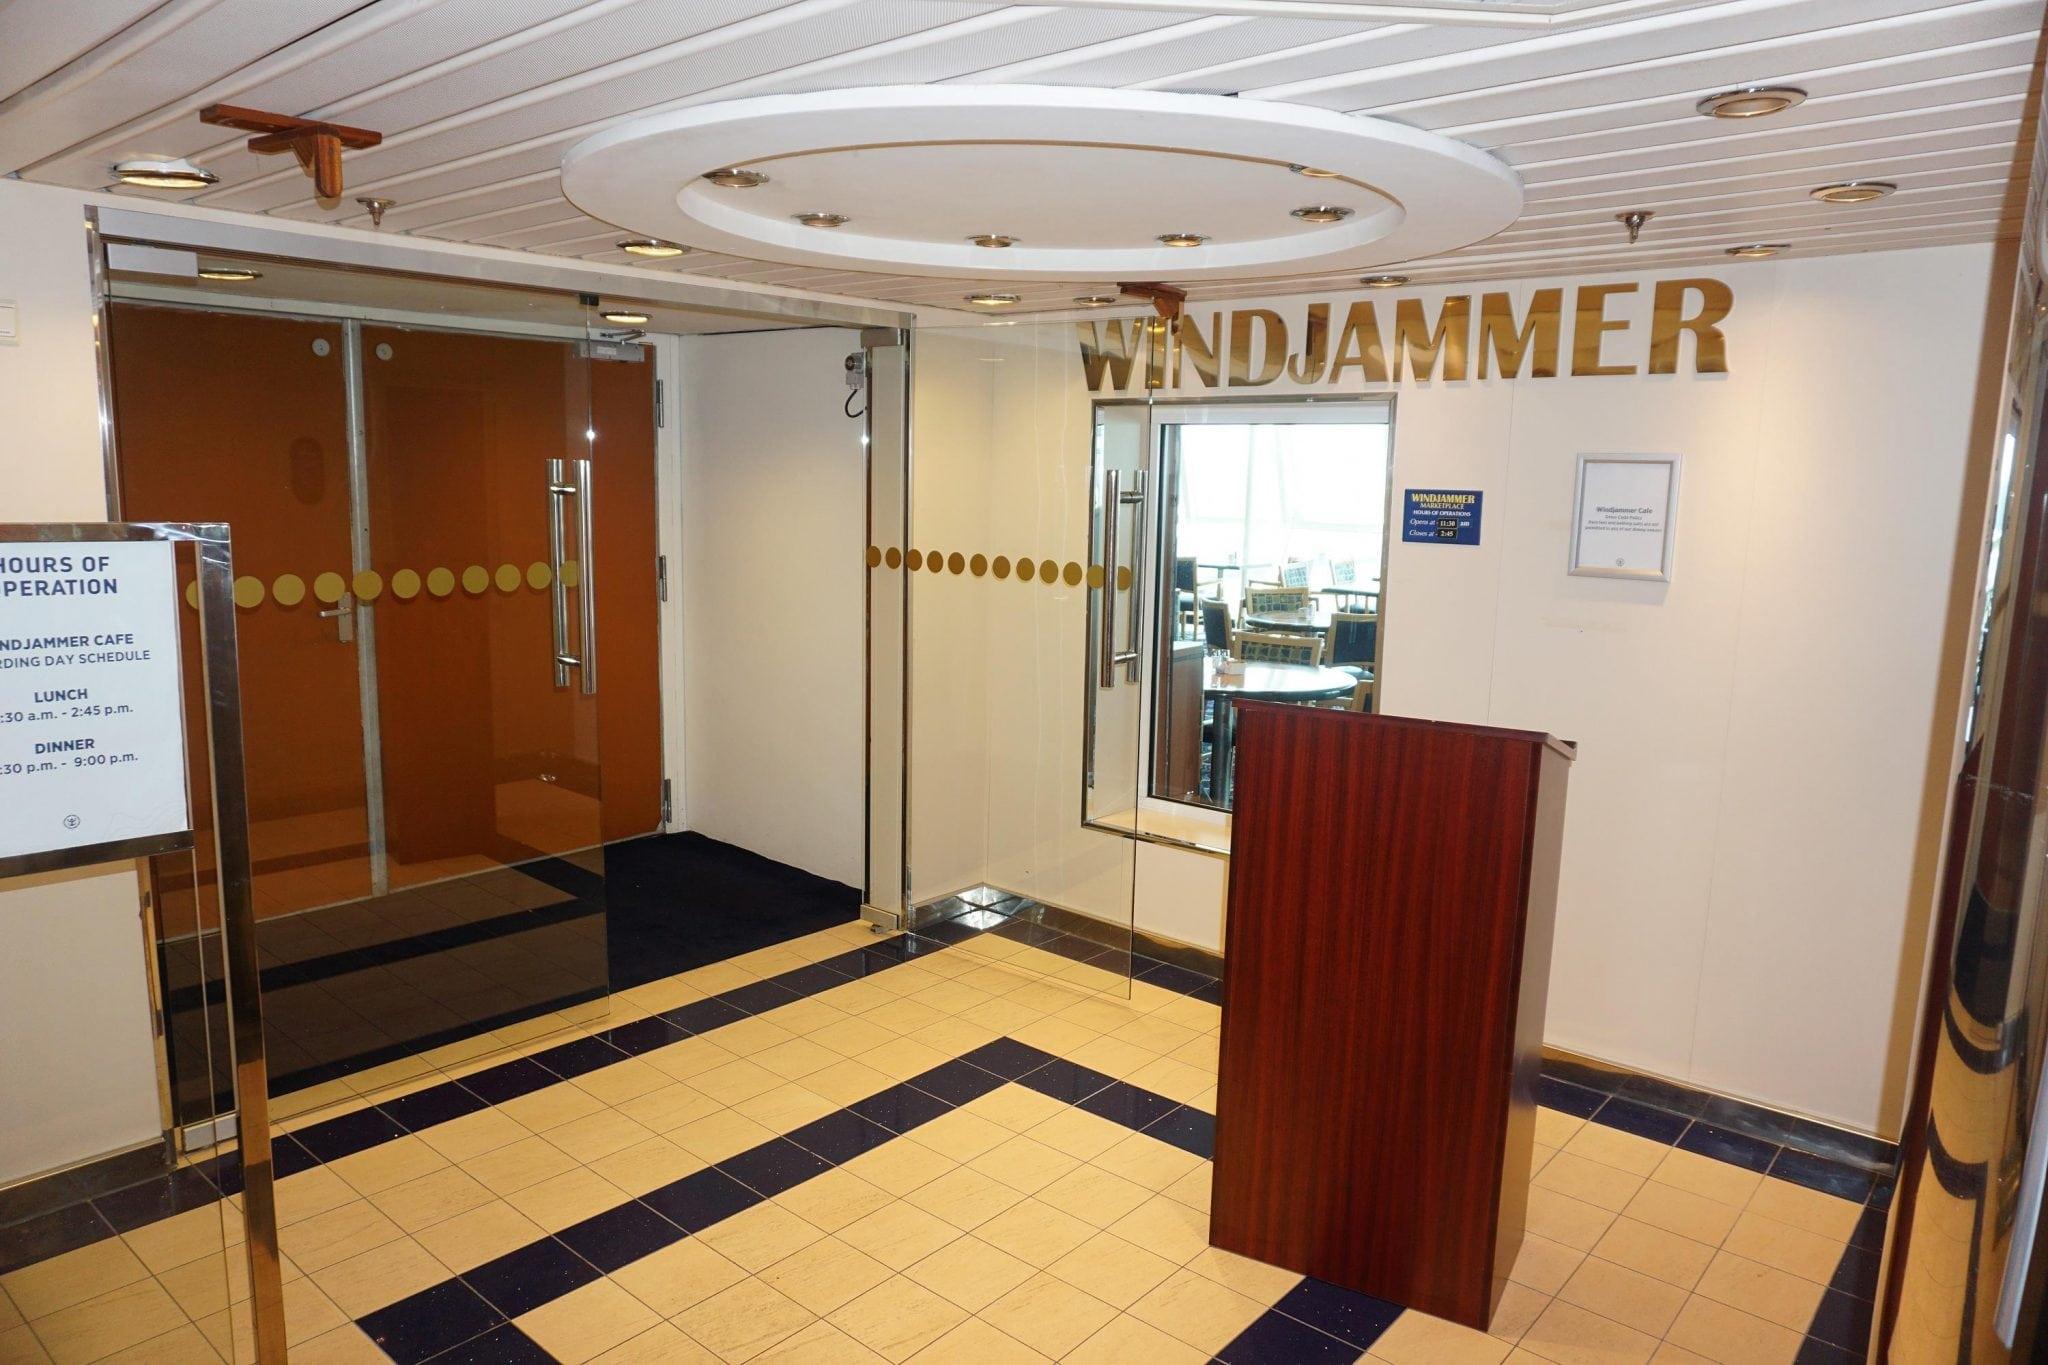 Entrance to Windjammer on Majesty